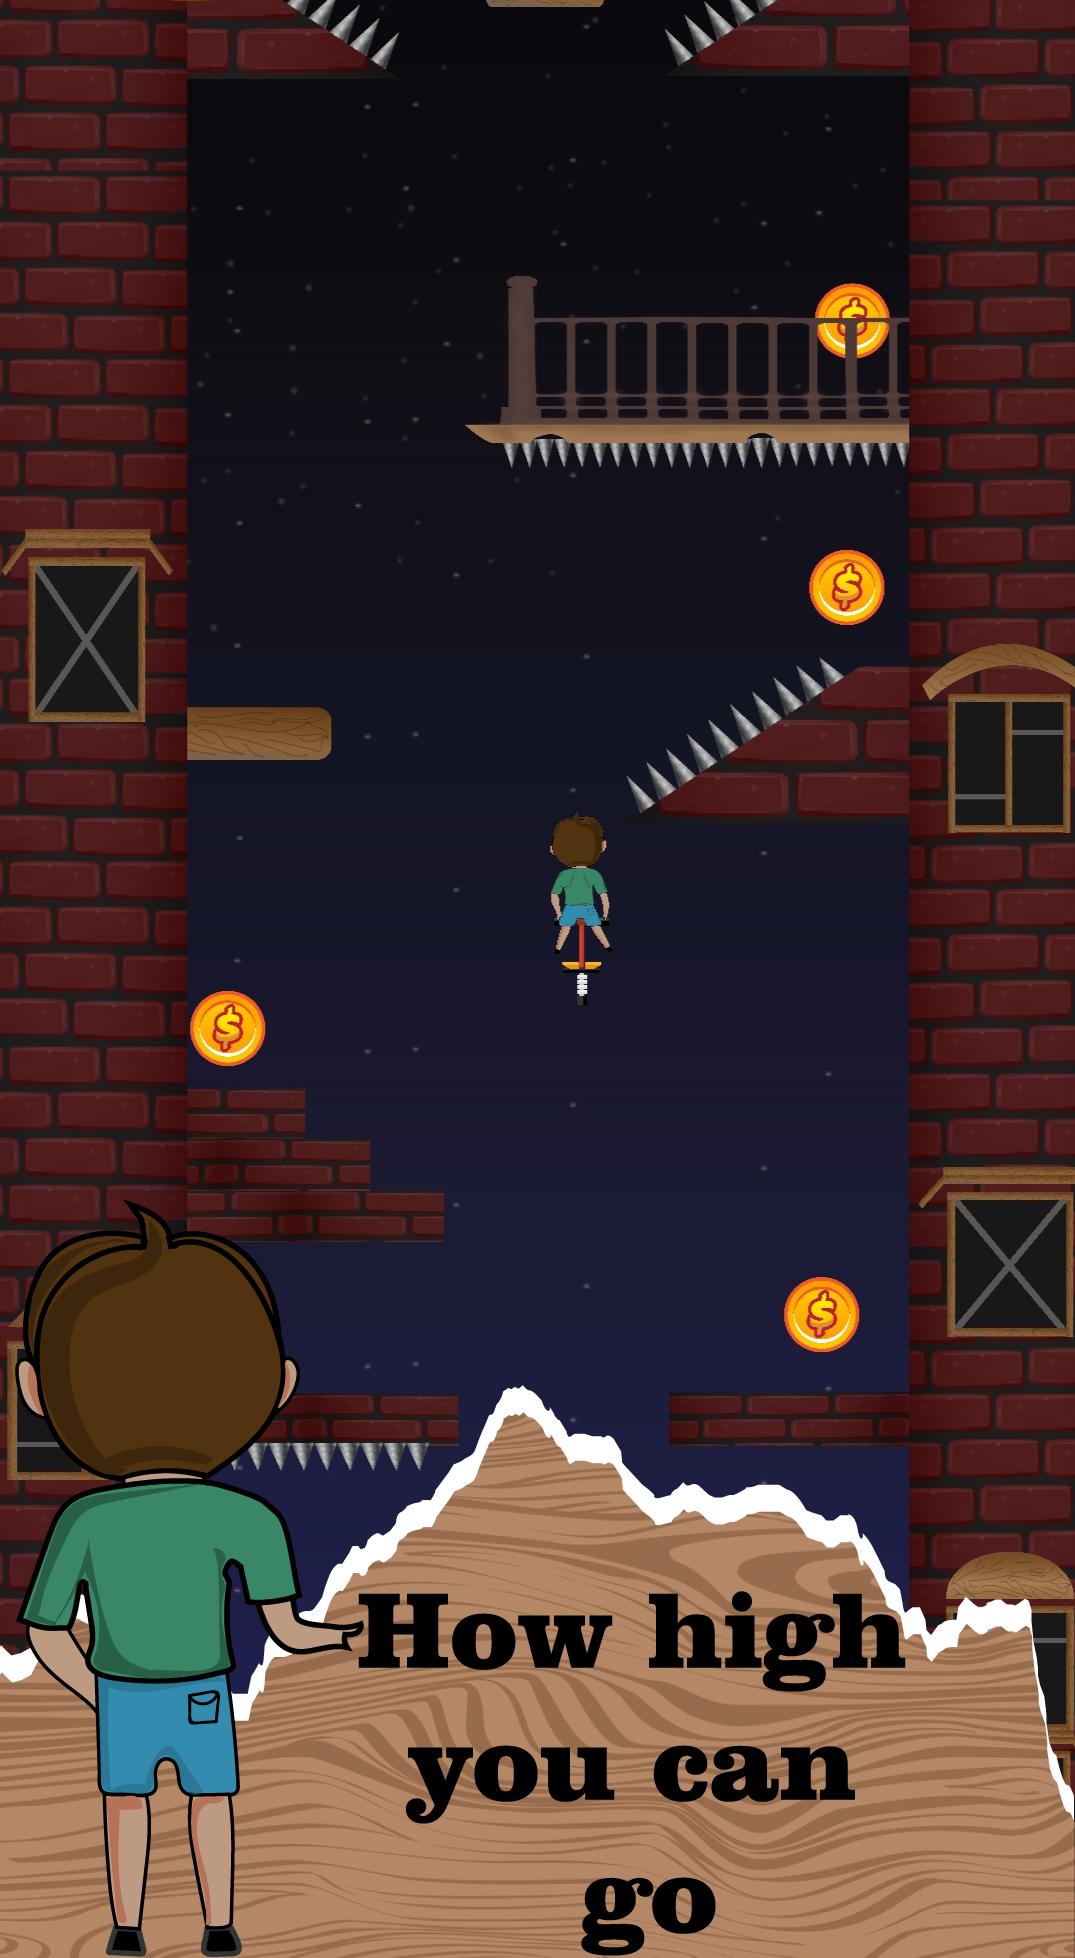 Jumping Jack スクリーンショット1